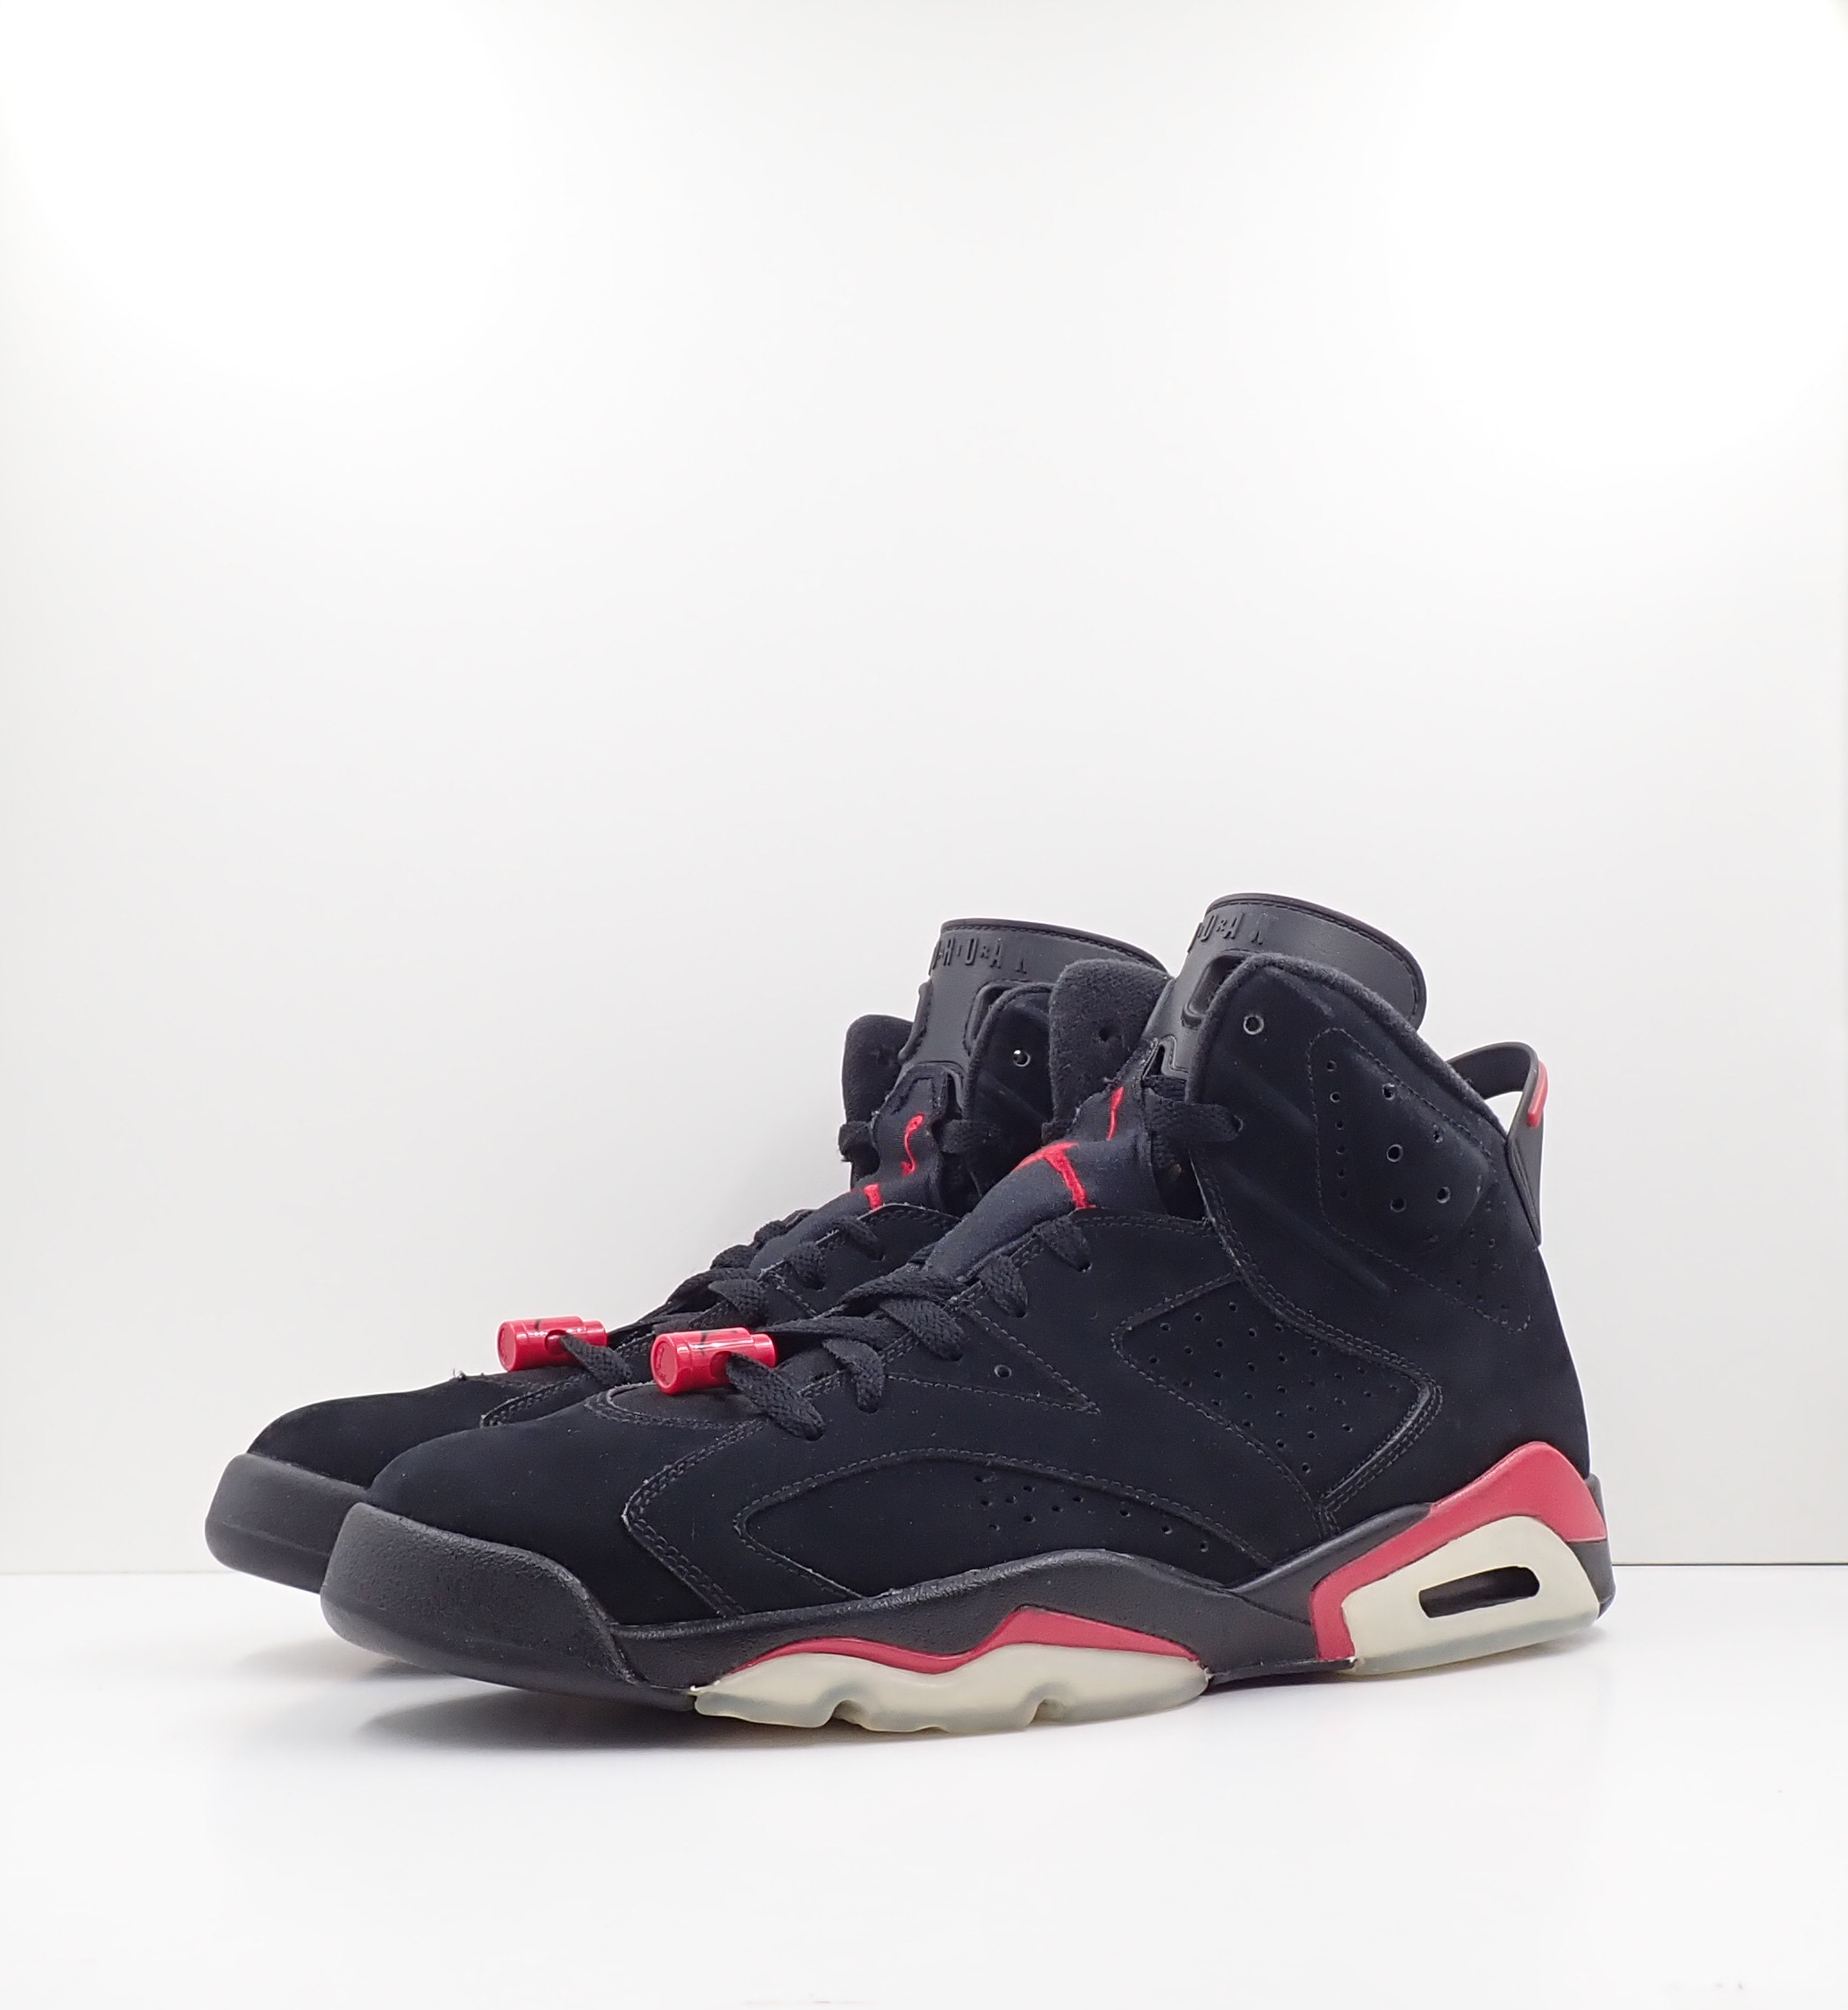 Jordan 6 Retro Black Varsity Red (2010)